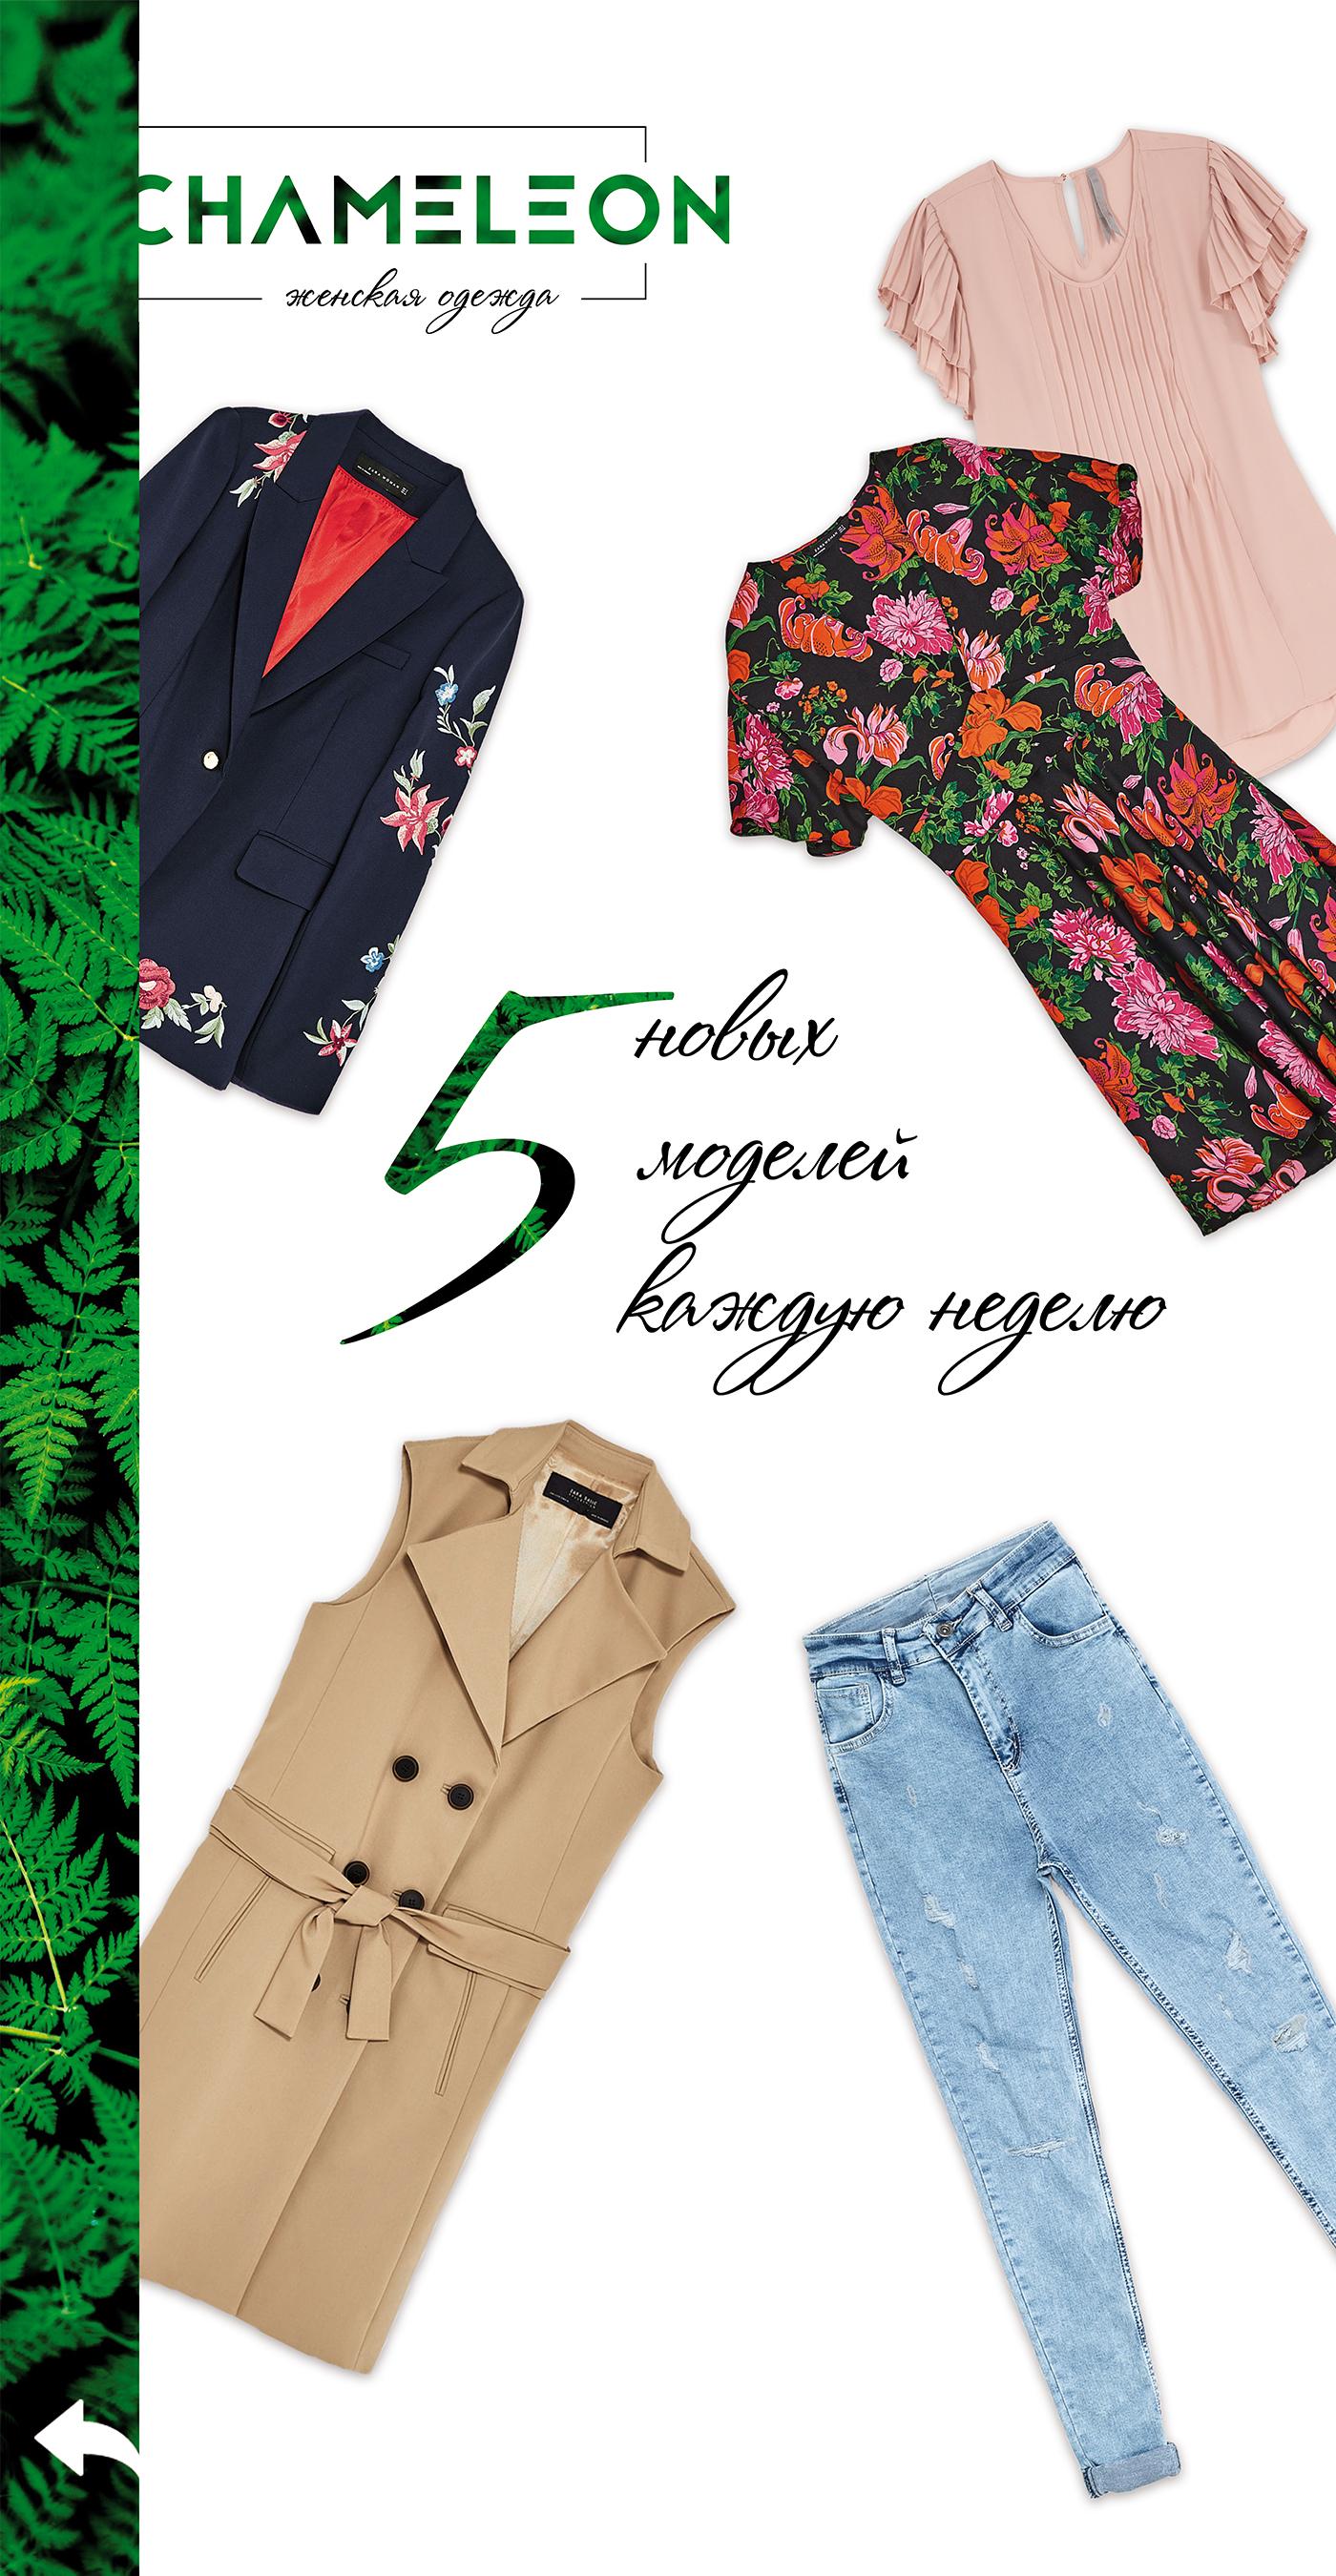 4970e2d3bc2 CHAMELEON-женская одежда – реклама магазина Instagram - Фрилансер ...